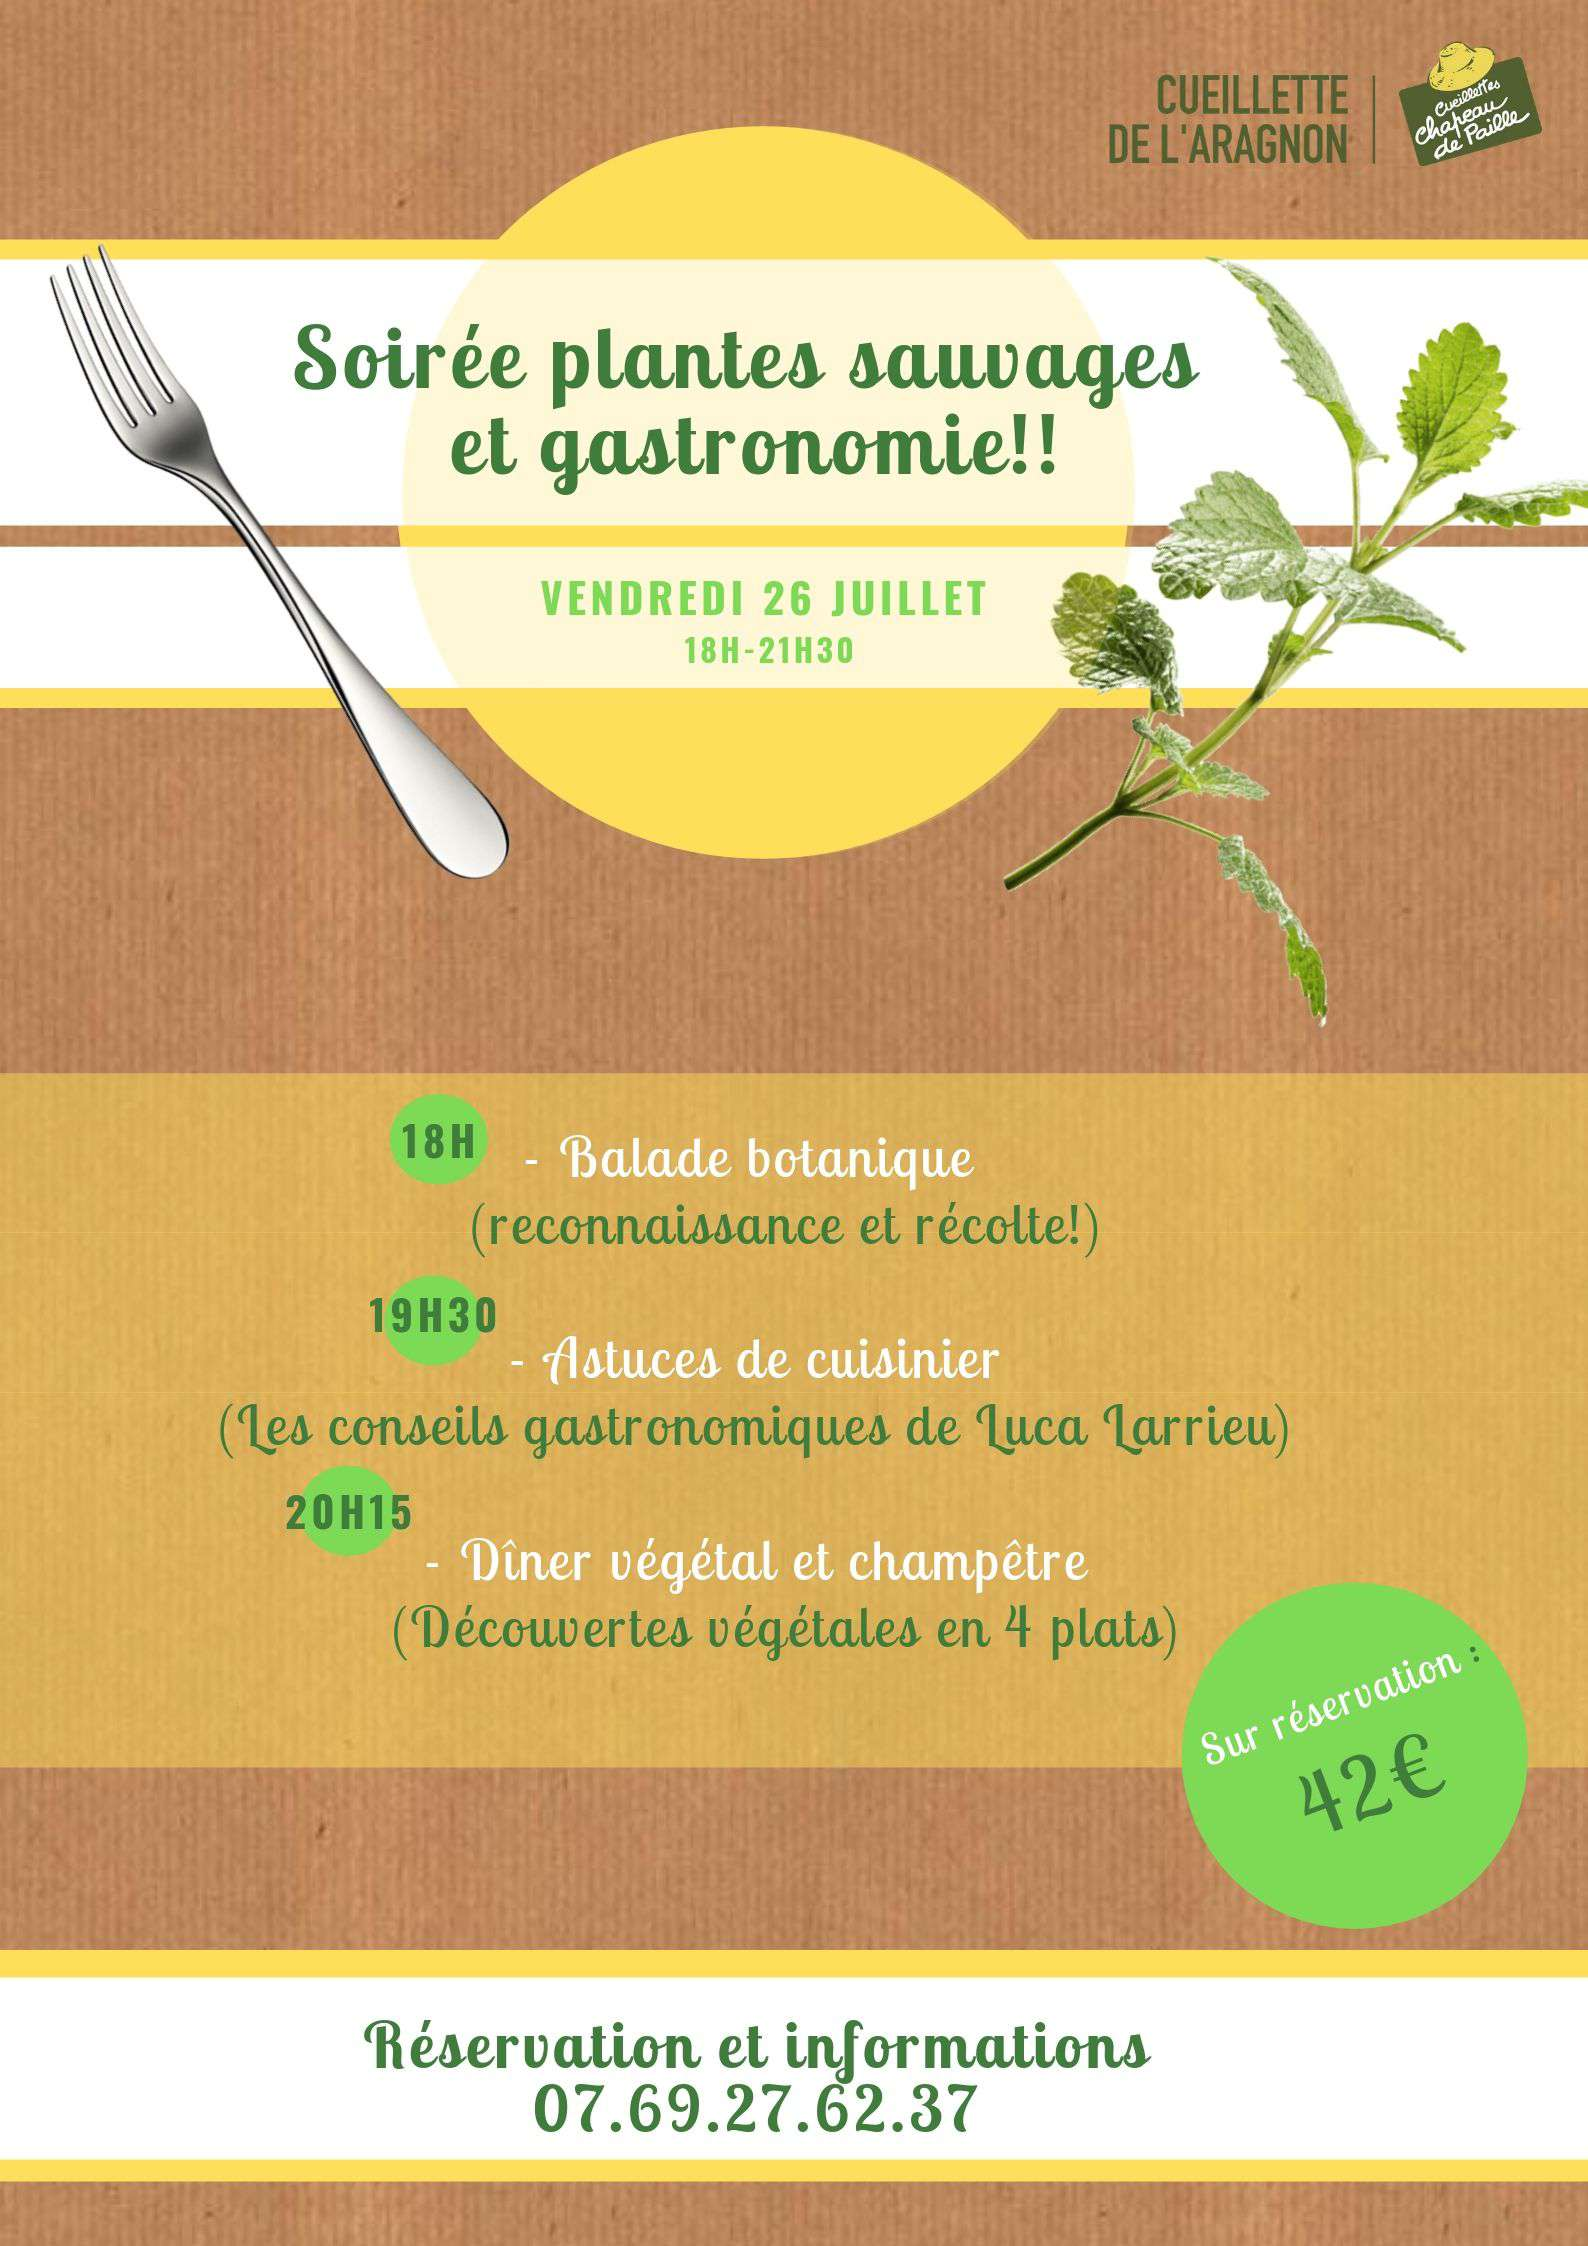 Dîner champêtre et plantes sauvages!